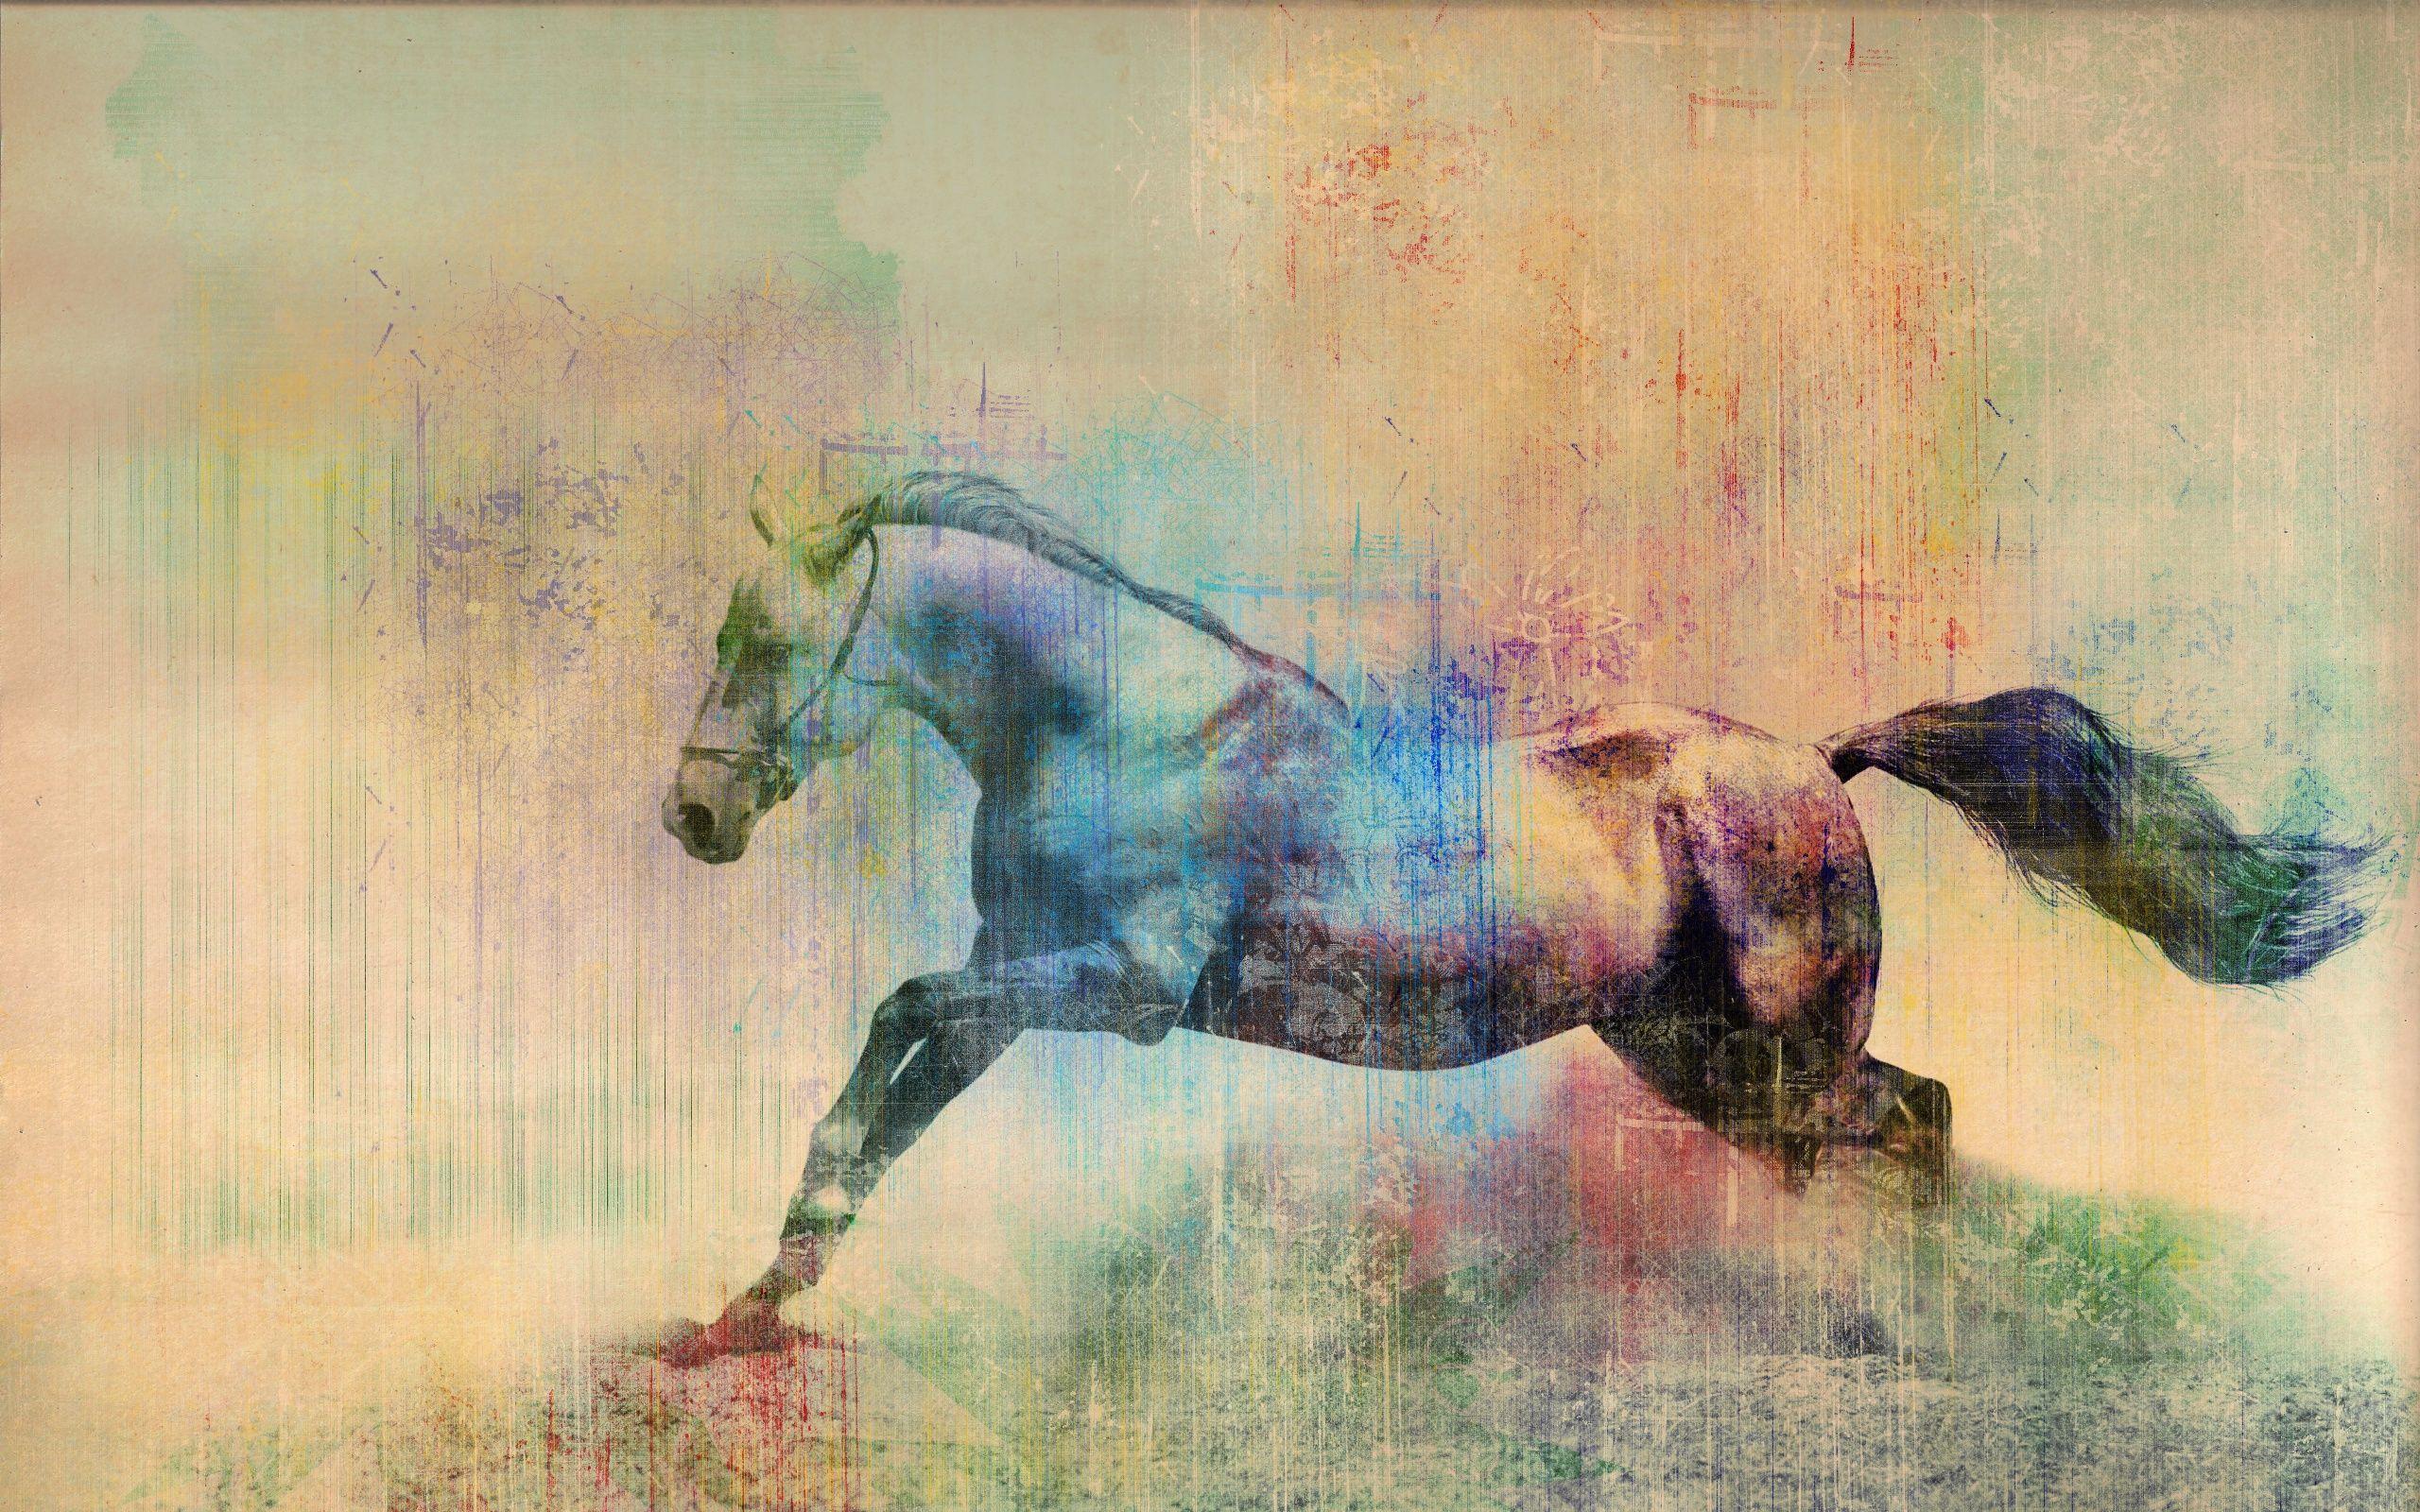 Horse Art Wallpapers Top Free Horse Art Backgrounds